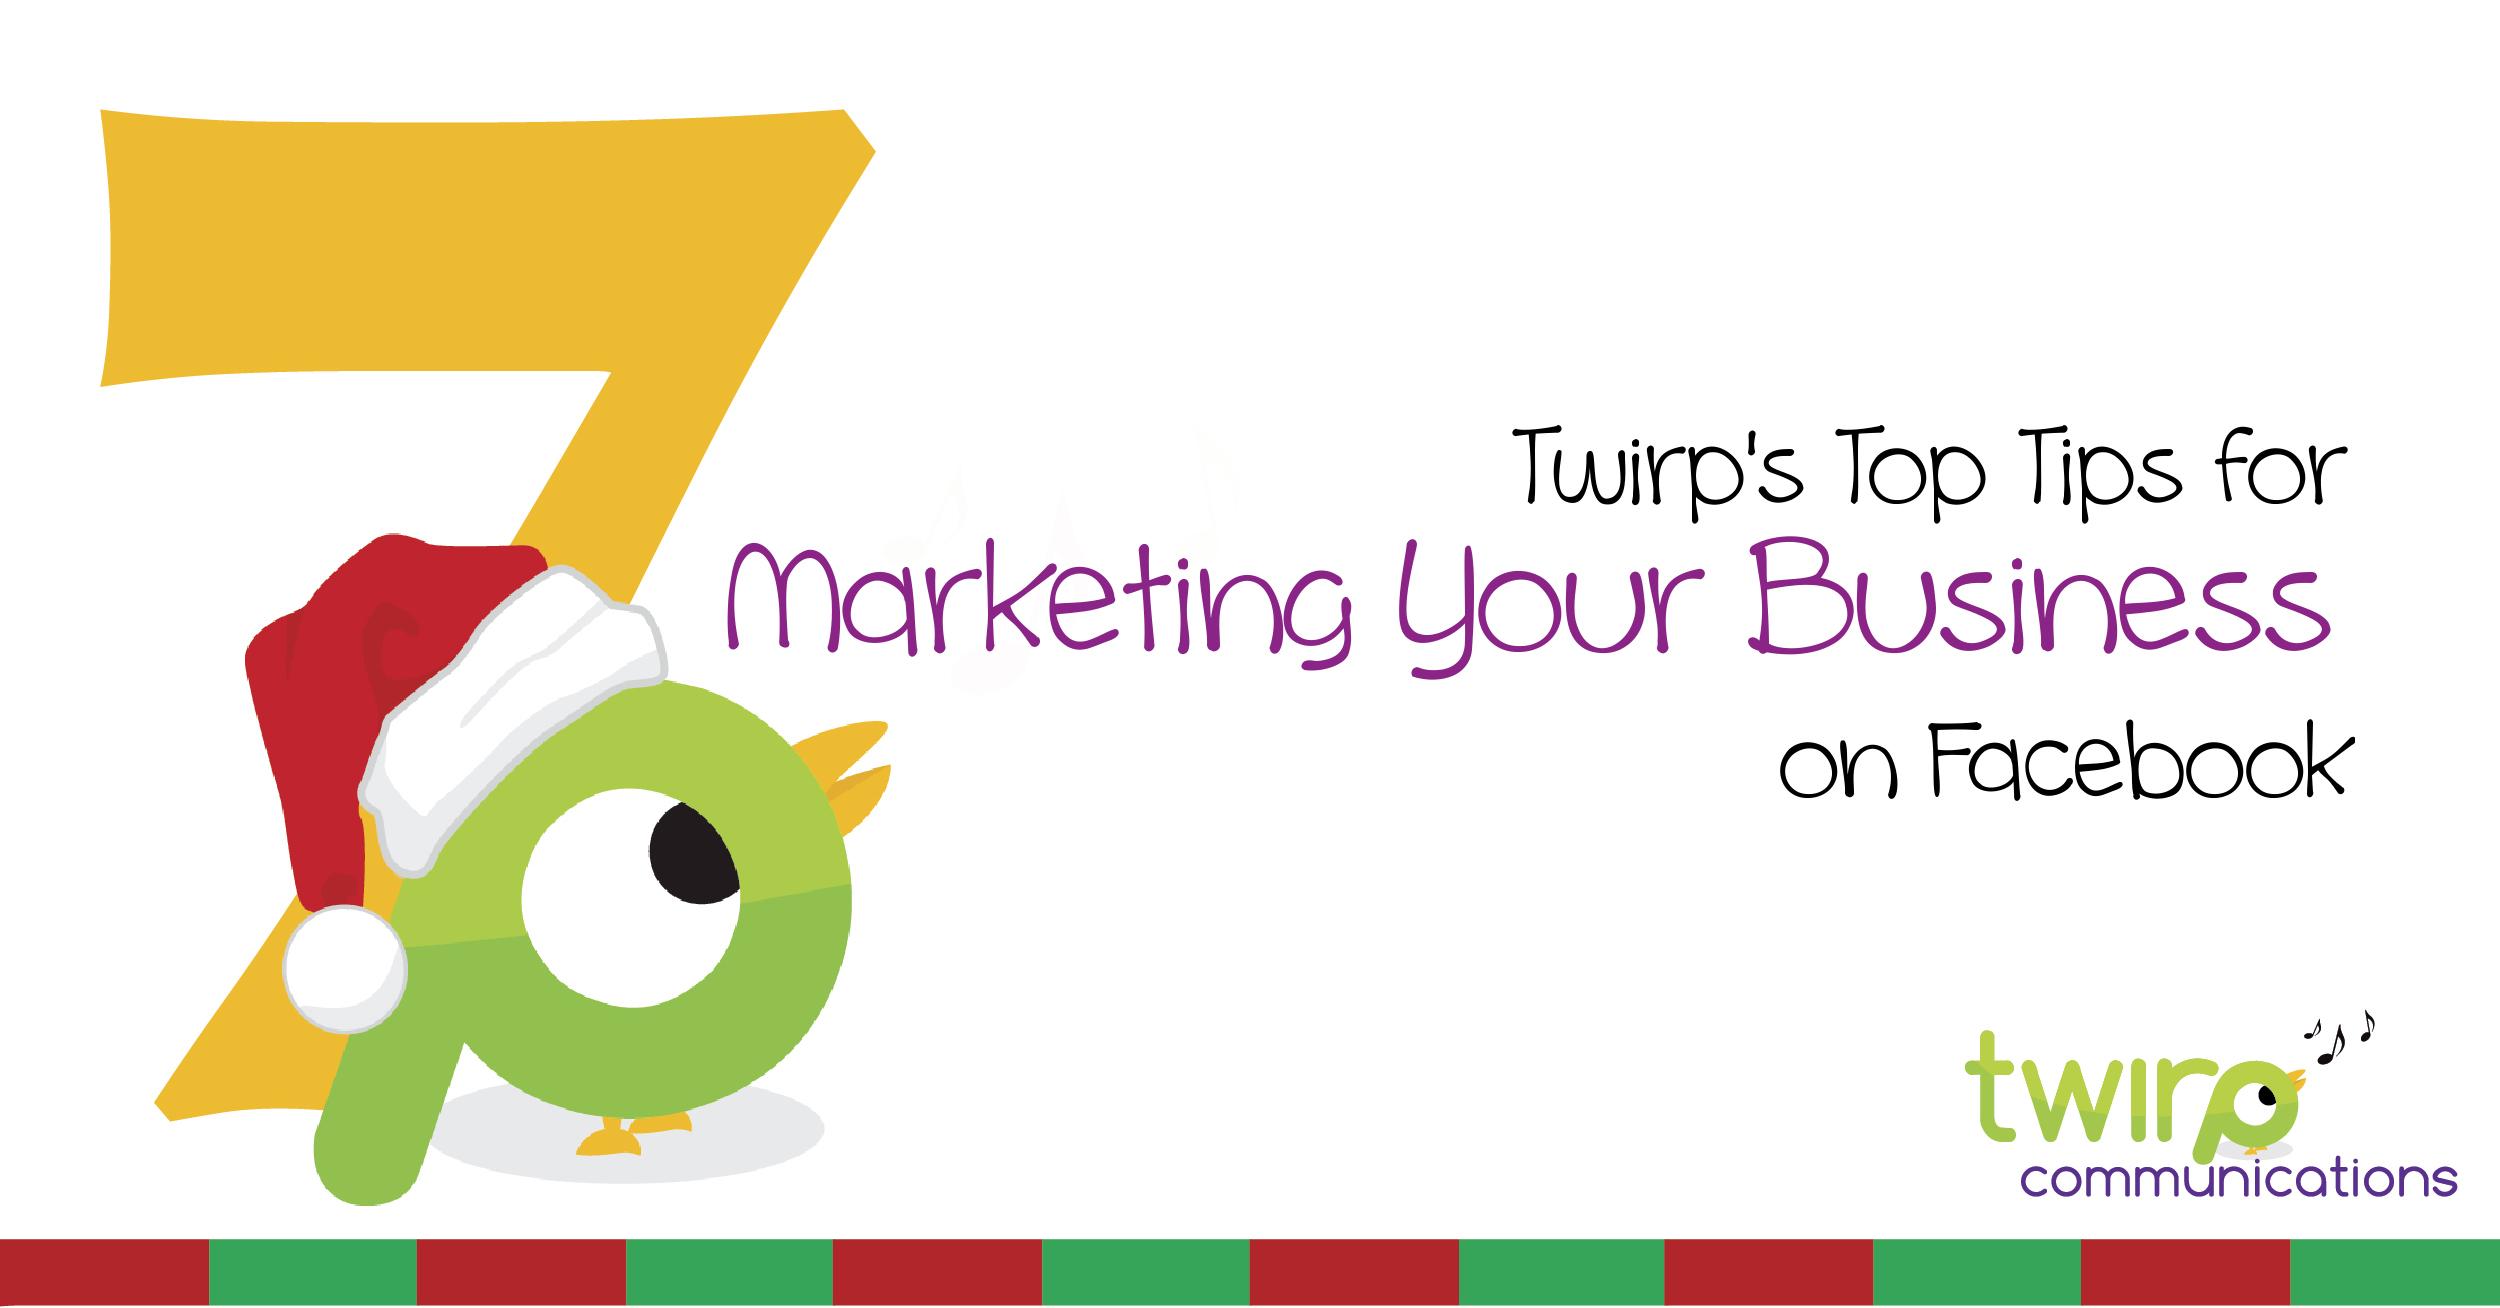 Facebook Business: Marketing on Facebook